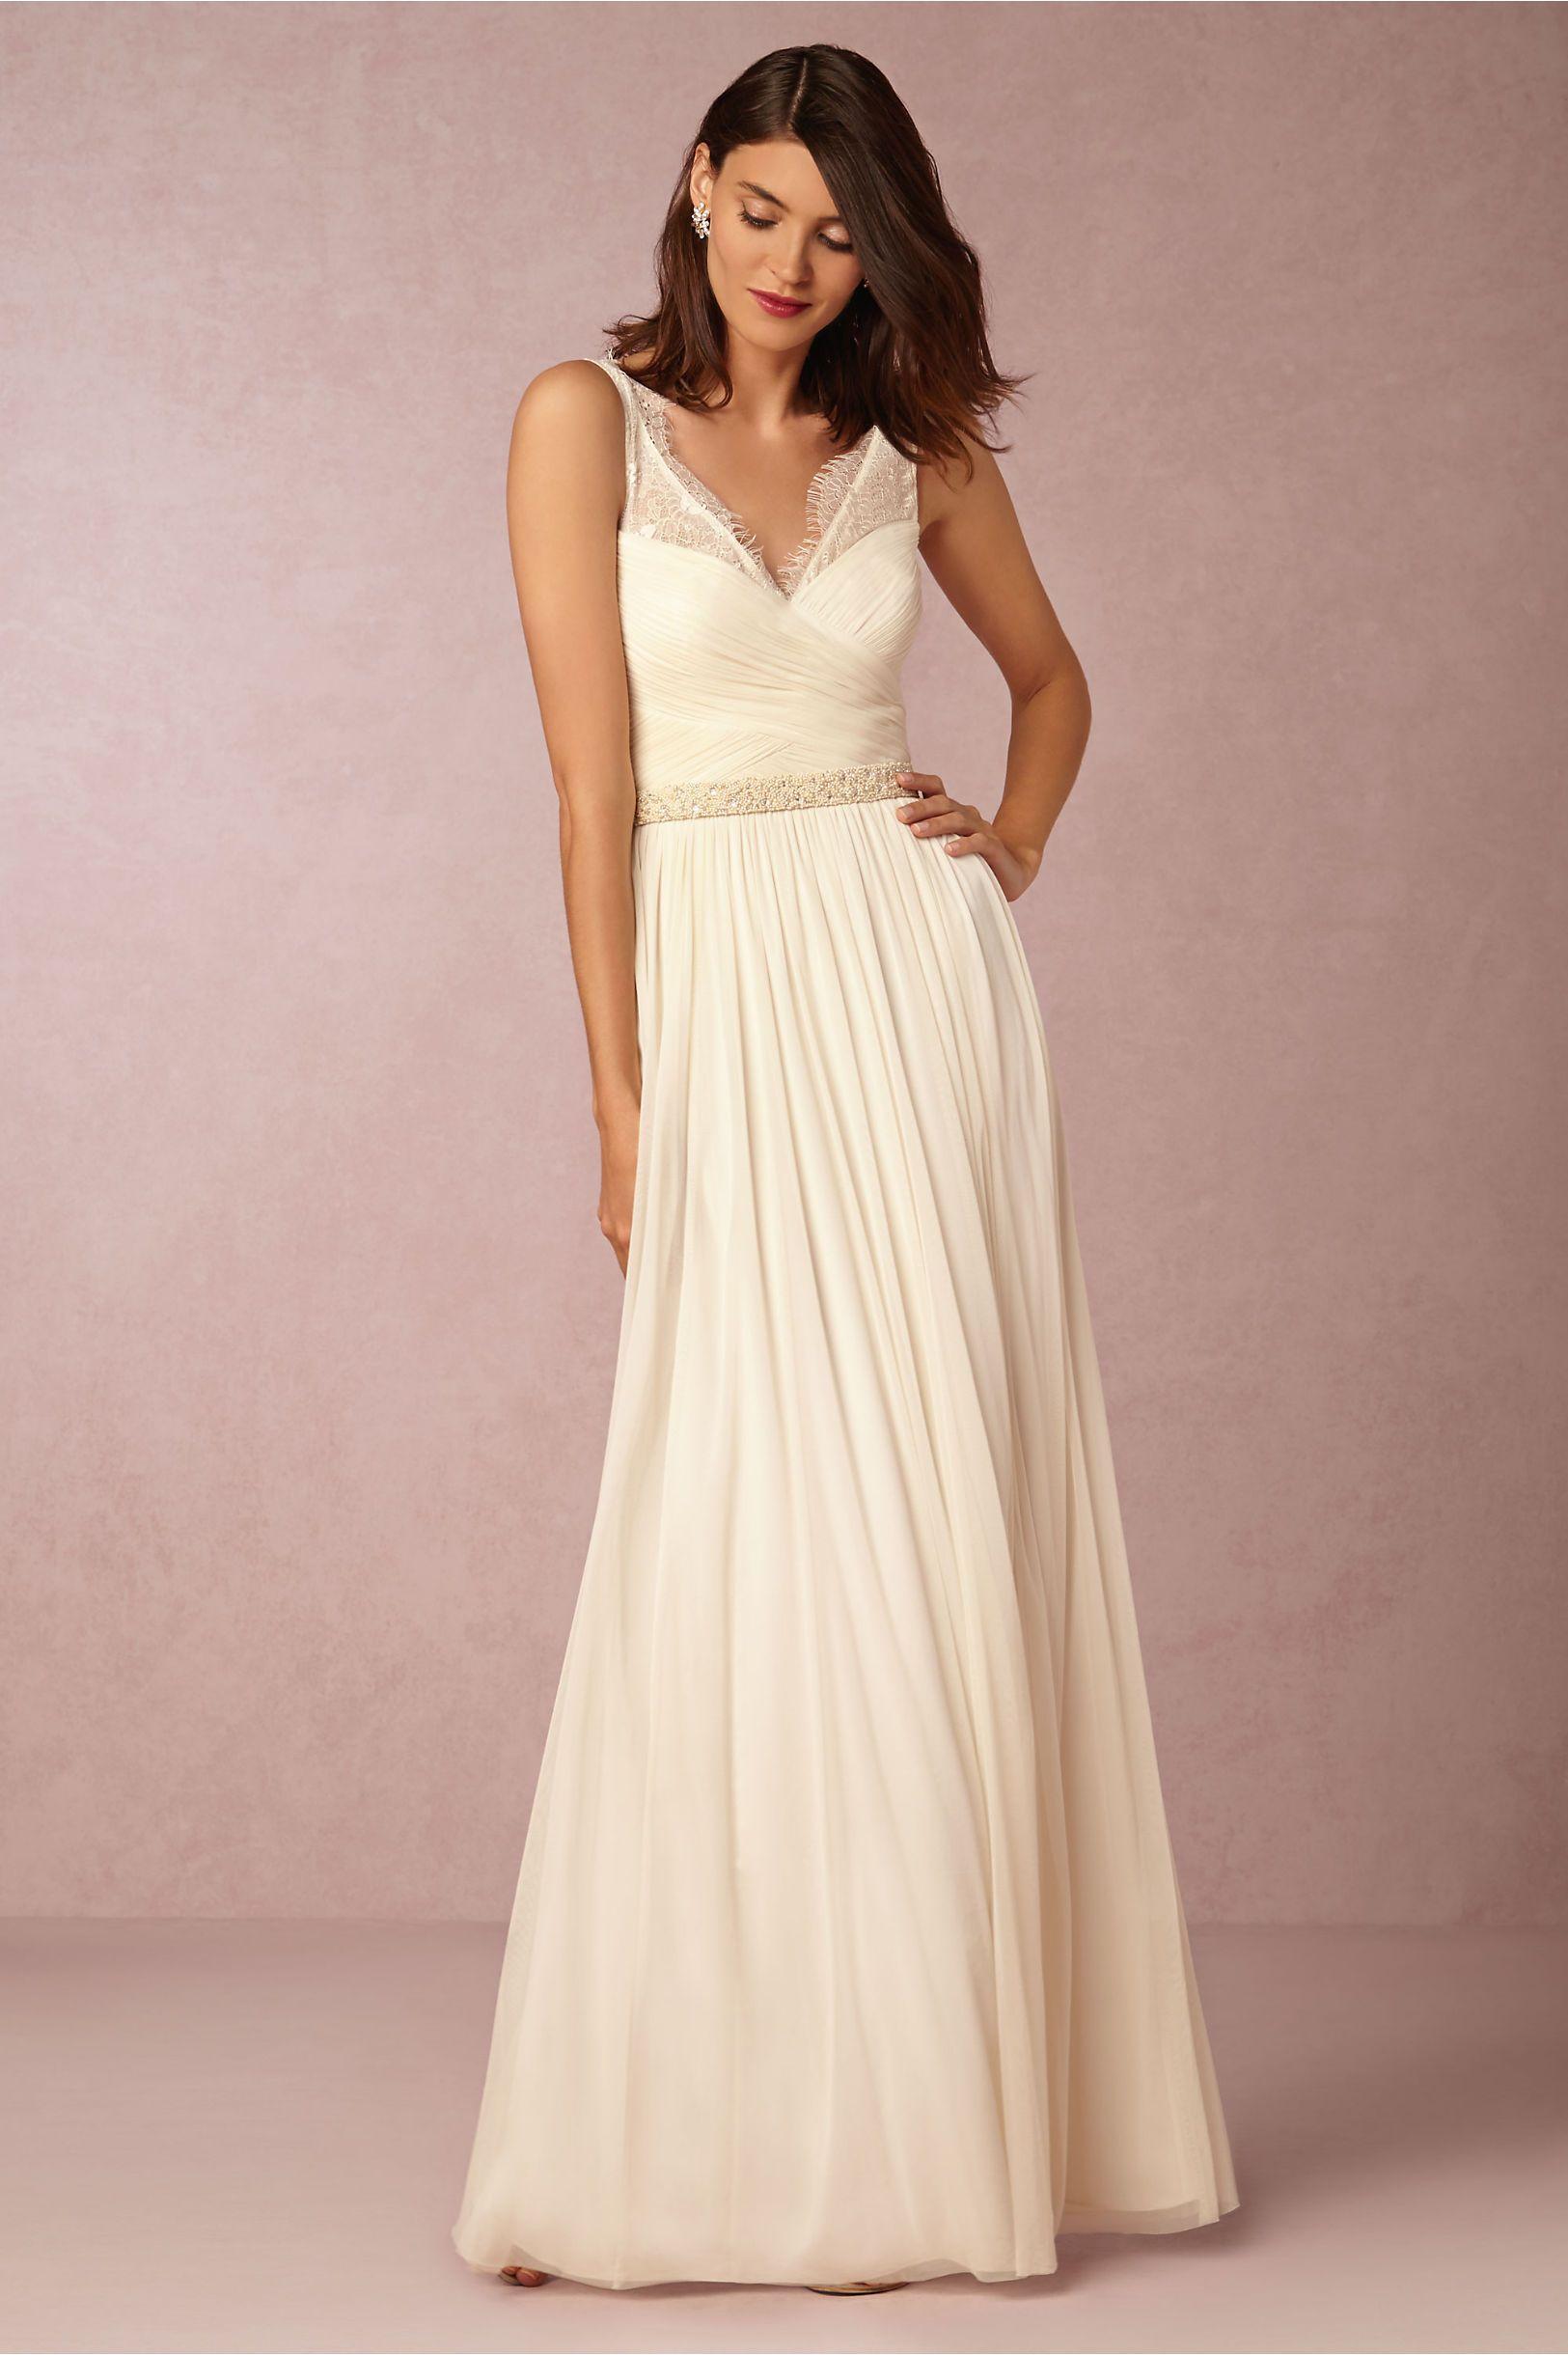 Ivory Reception Dress